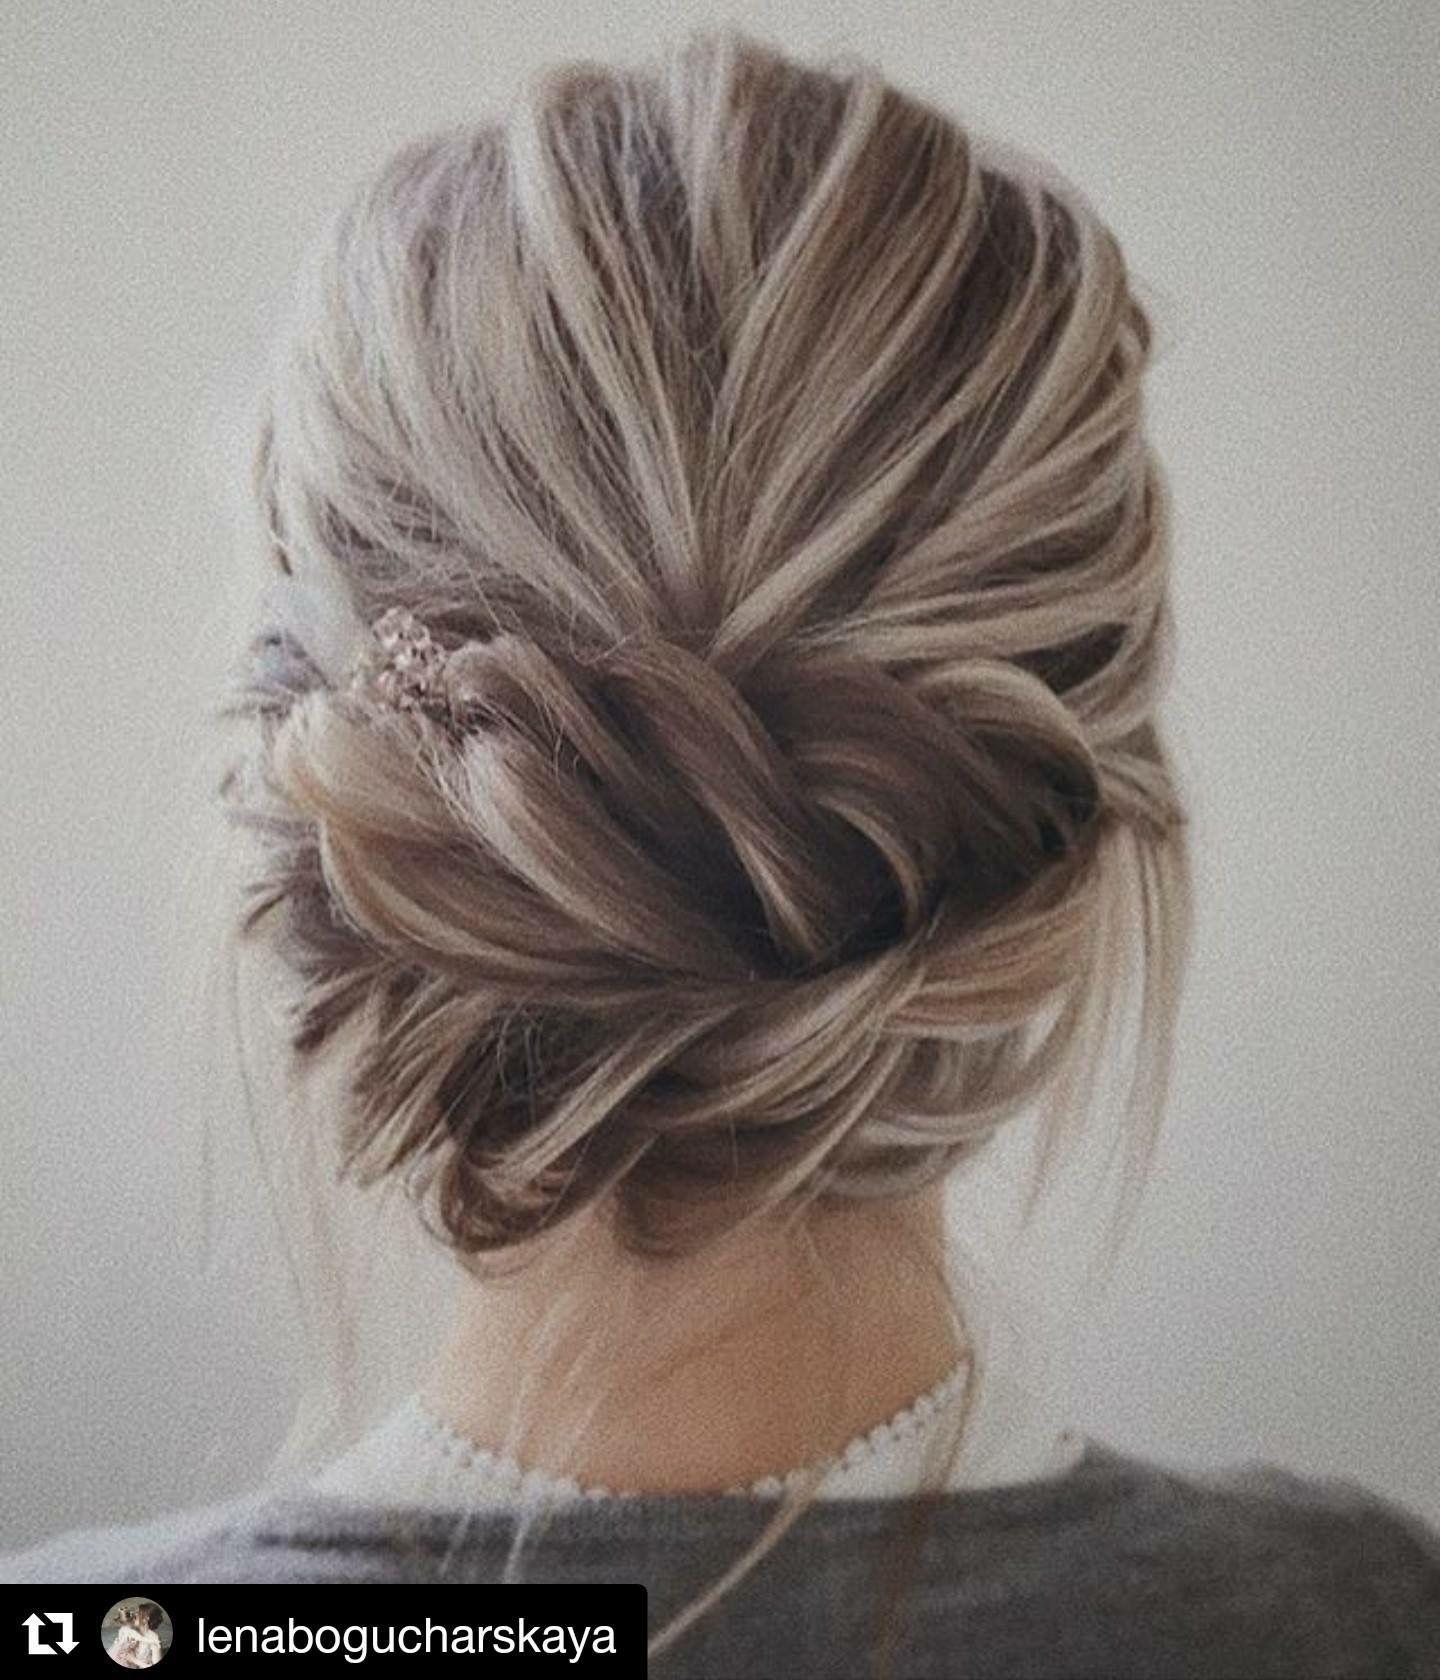 Hair hairstyle fashion style love hair and beauty long hair